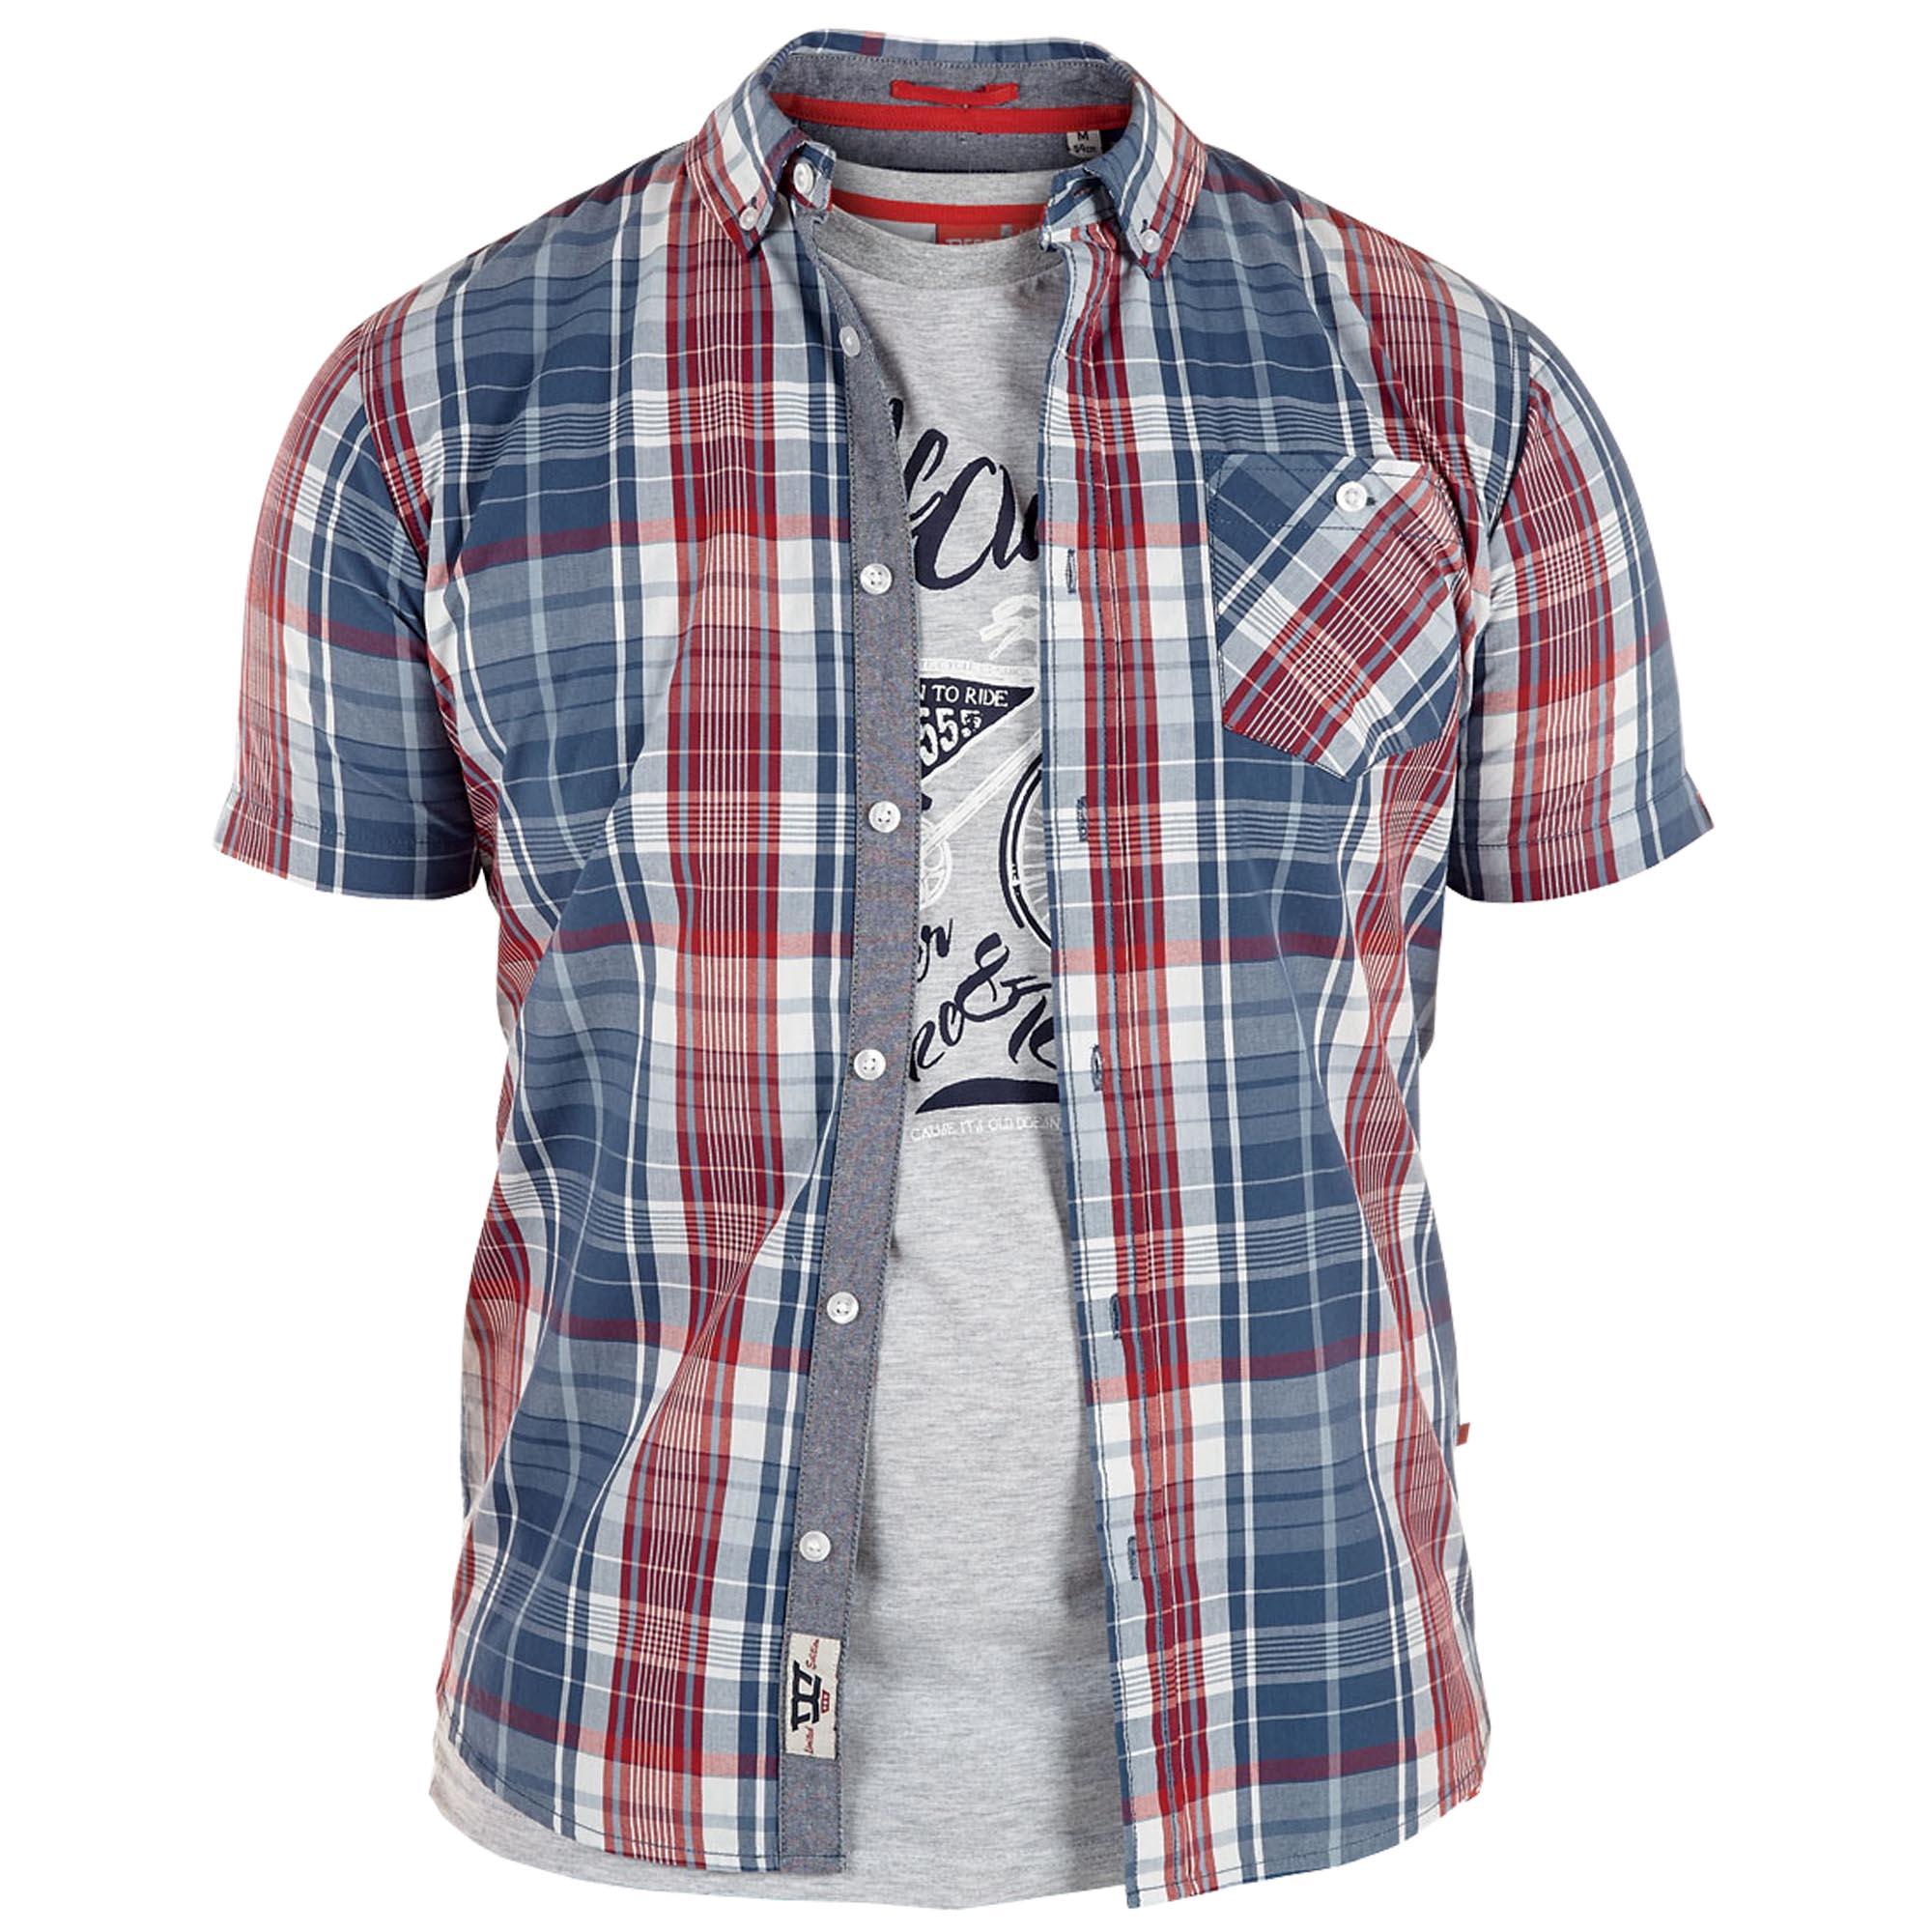 Short Sleeved Checked Blouse Uk 4